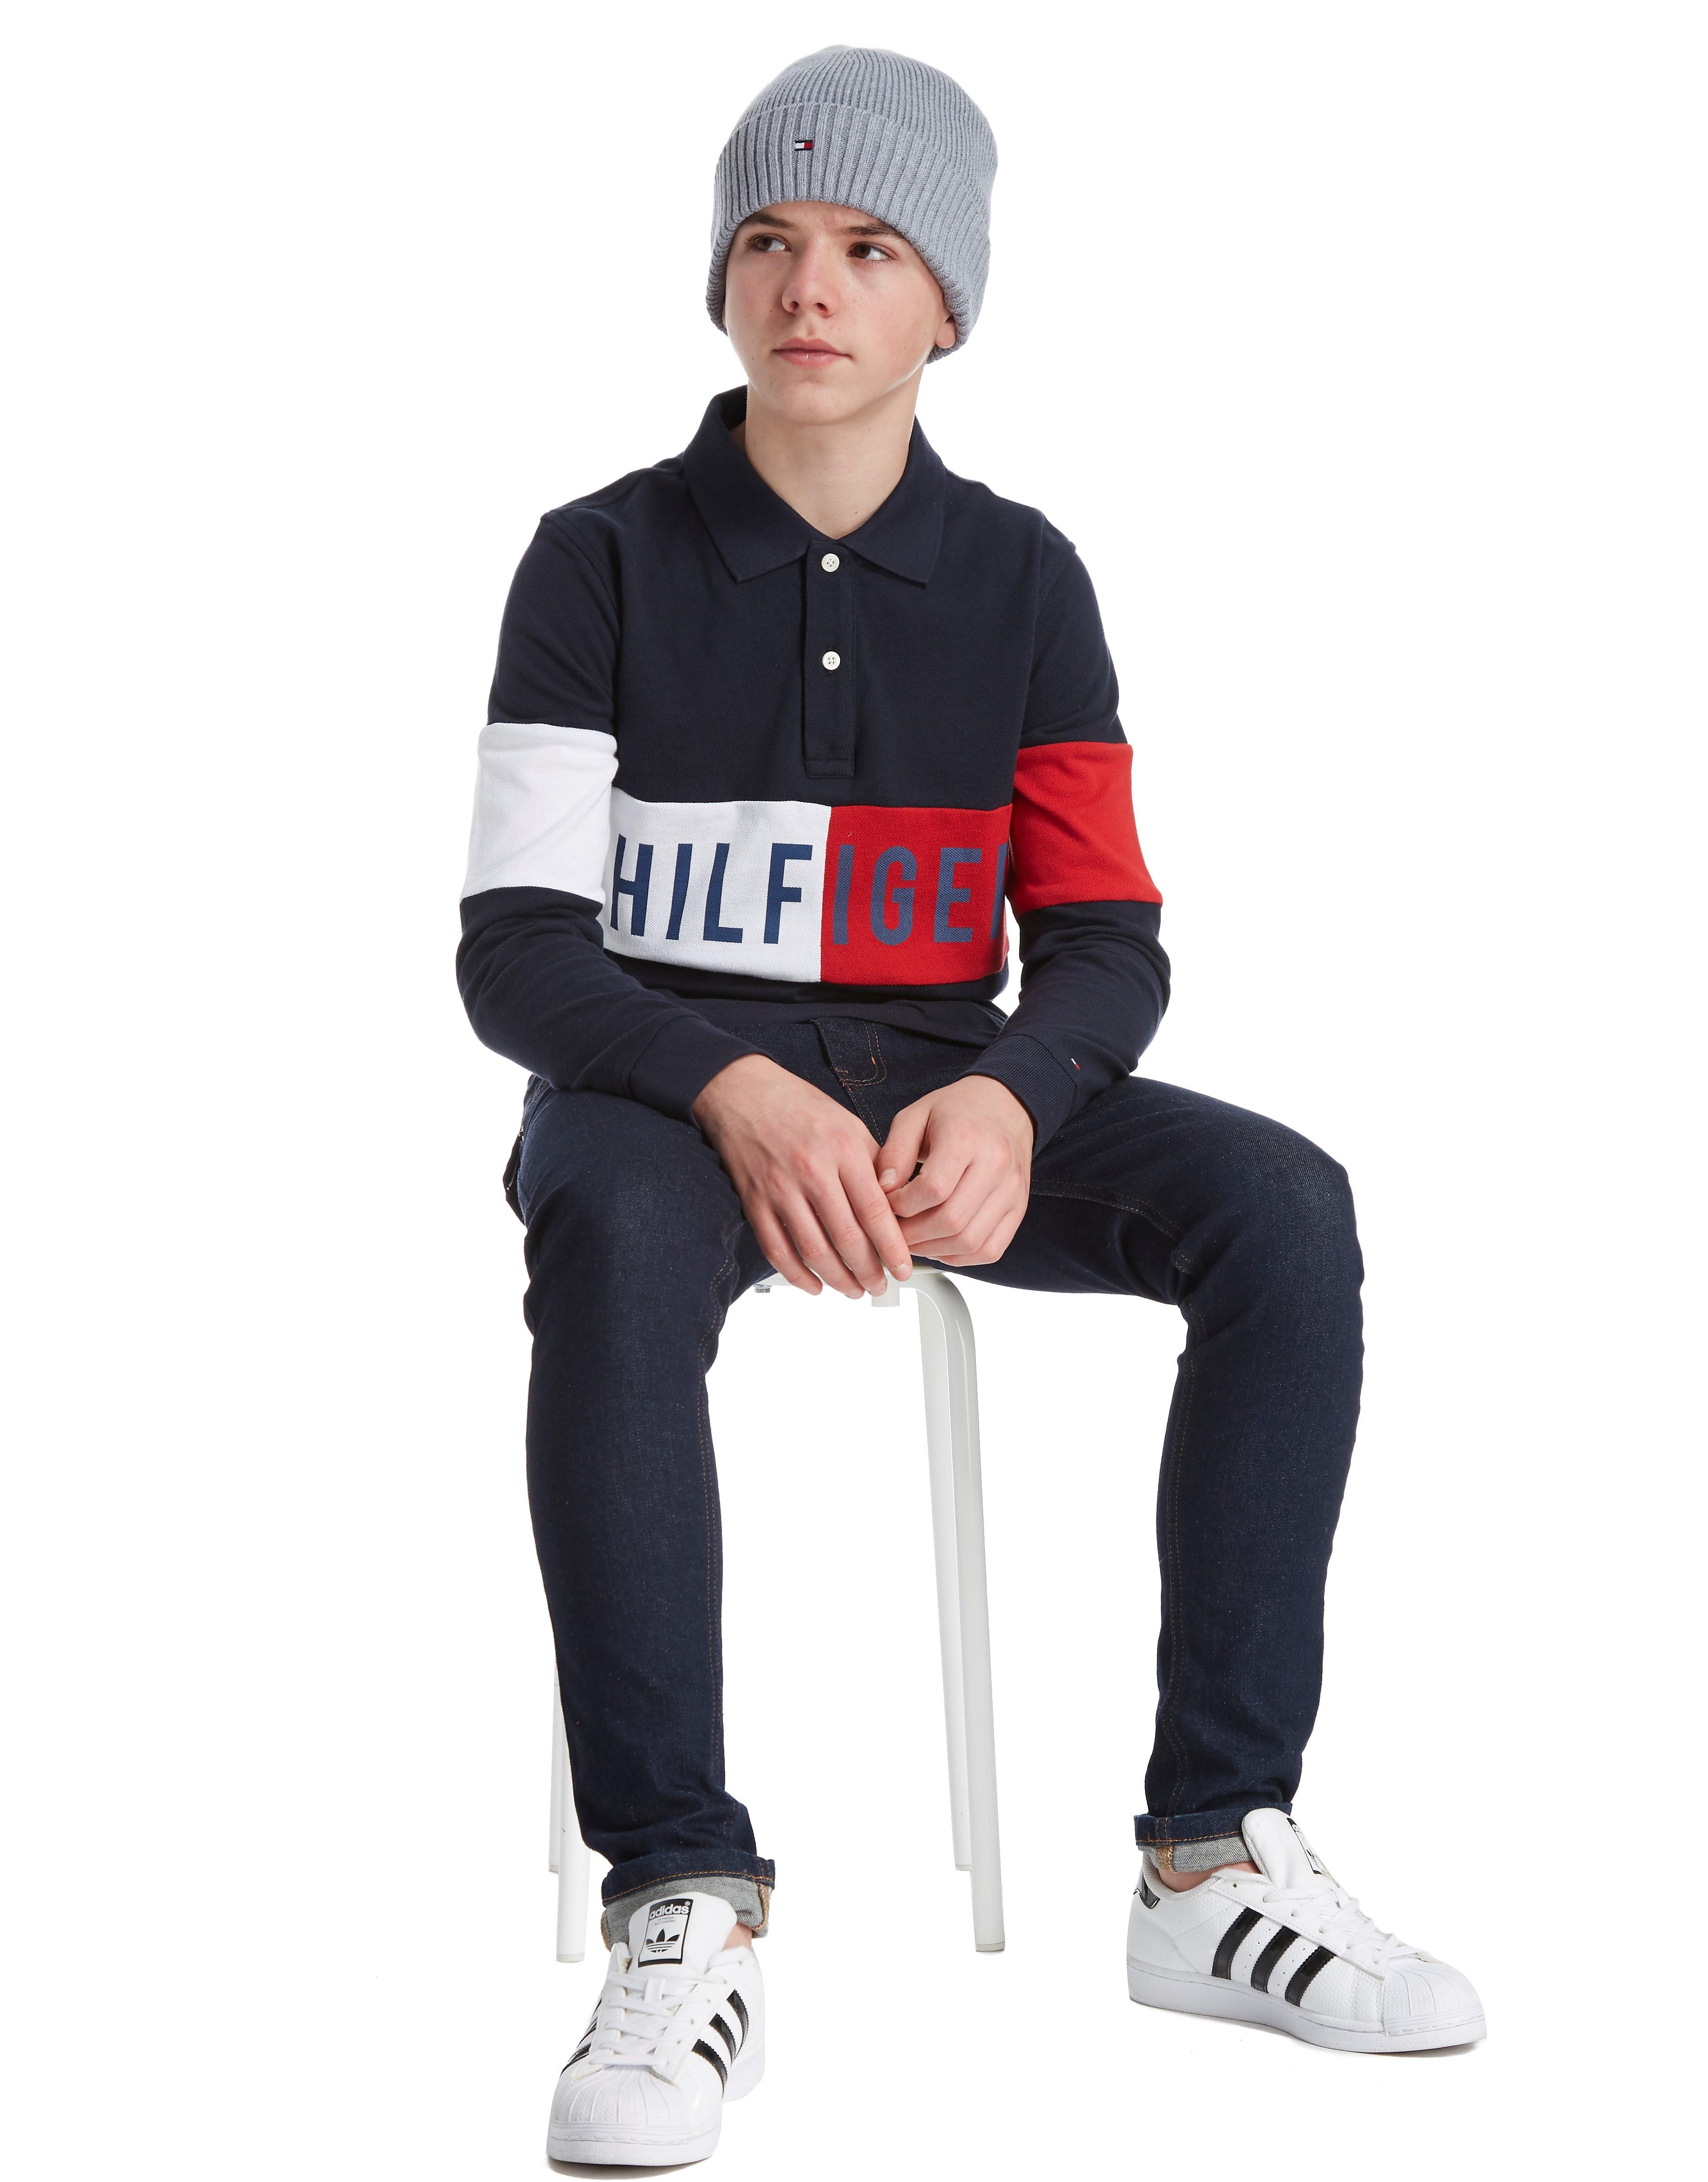 Tommy Hilfiger Colourblock Long Sleeve Polo Shirt Junior